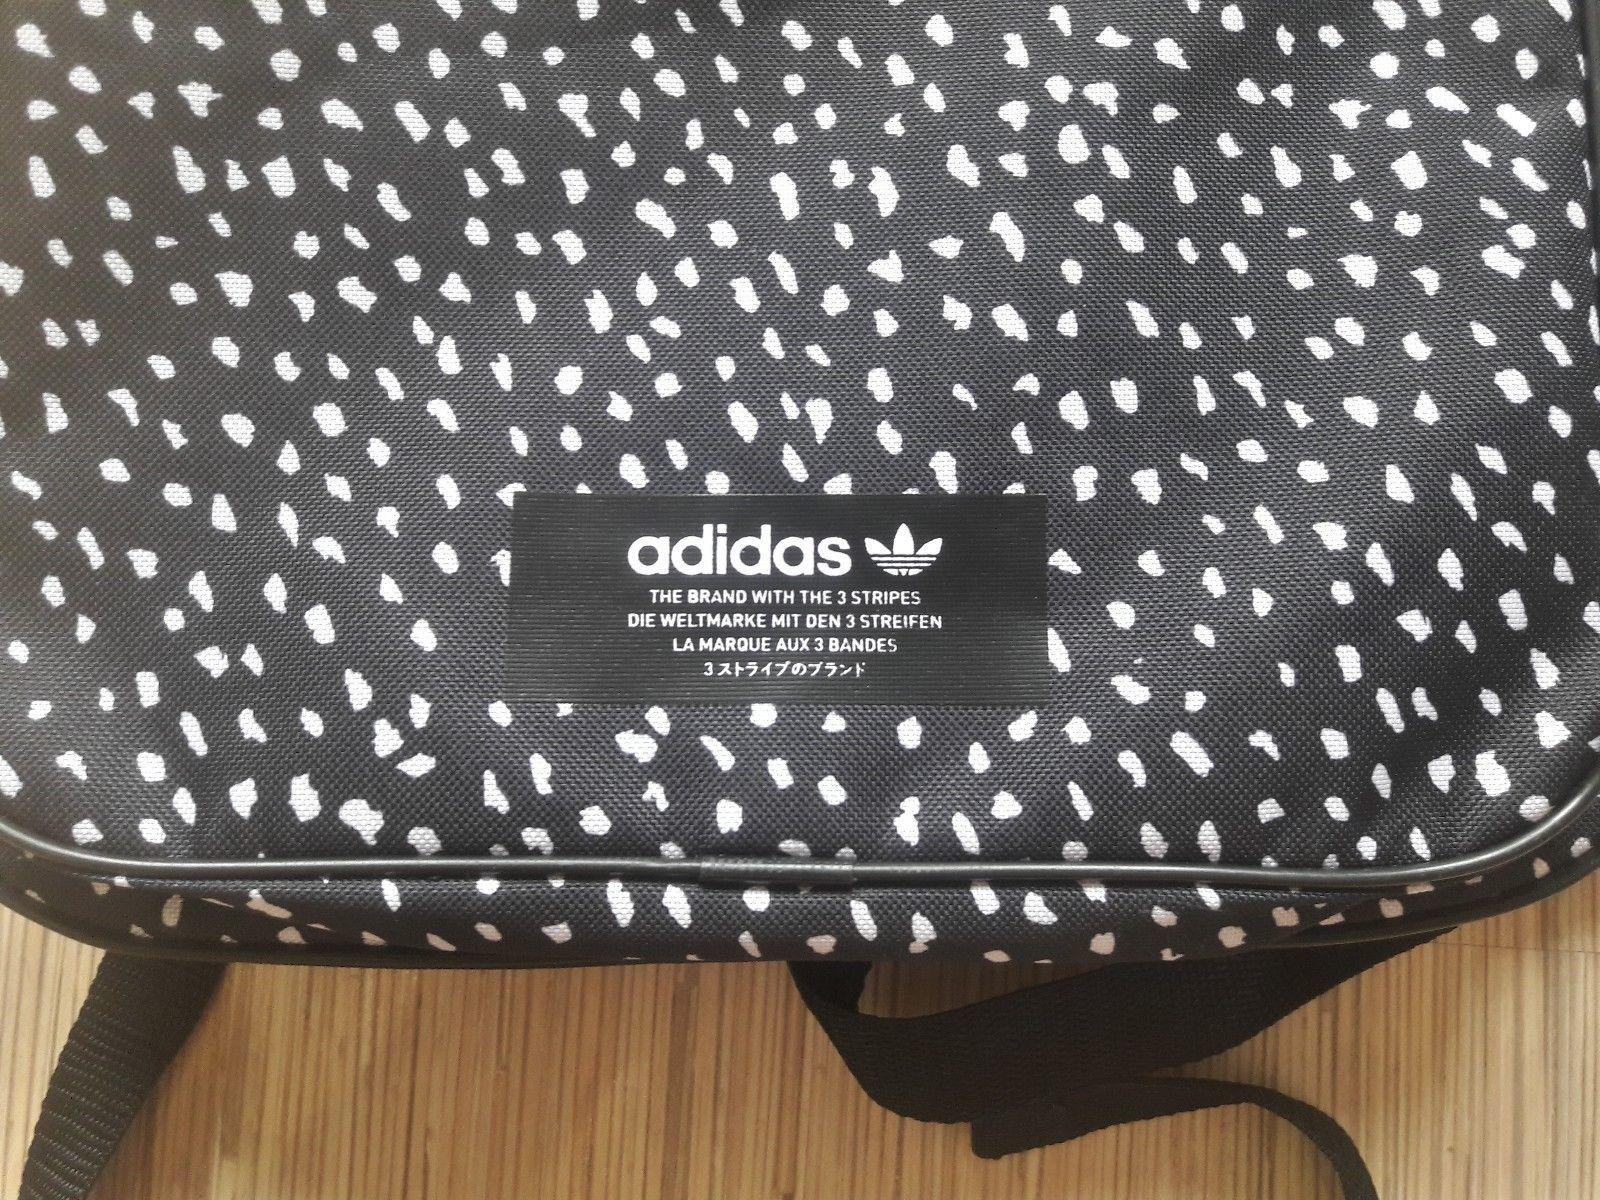 Adidas Originals POLKA-DOT-PRINT Backpack  BR5113 image 5